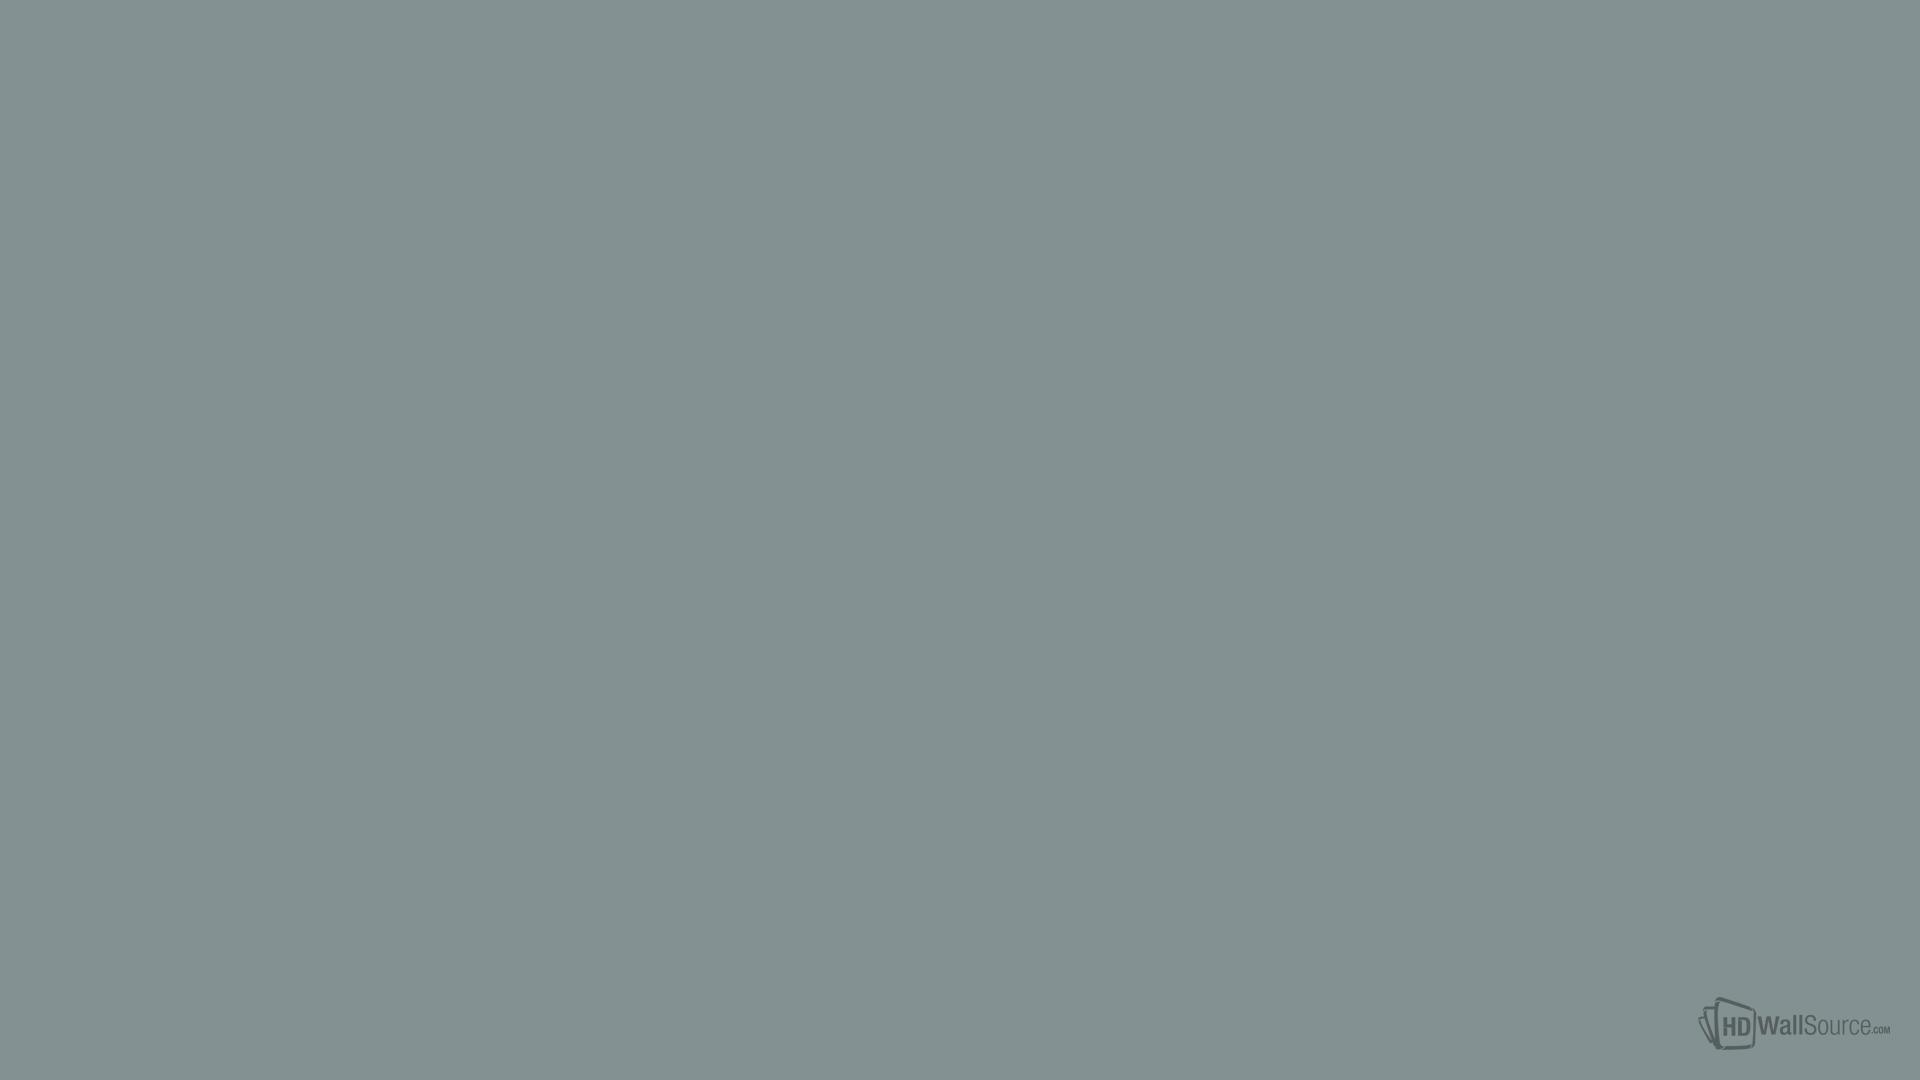 839192 wallpaper 70920